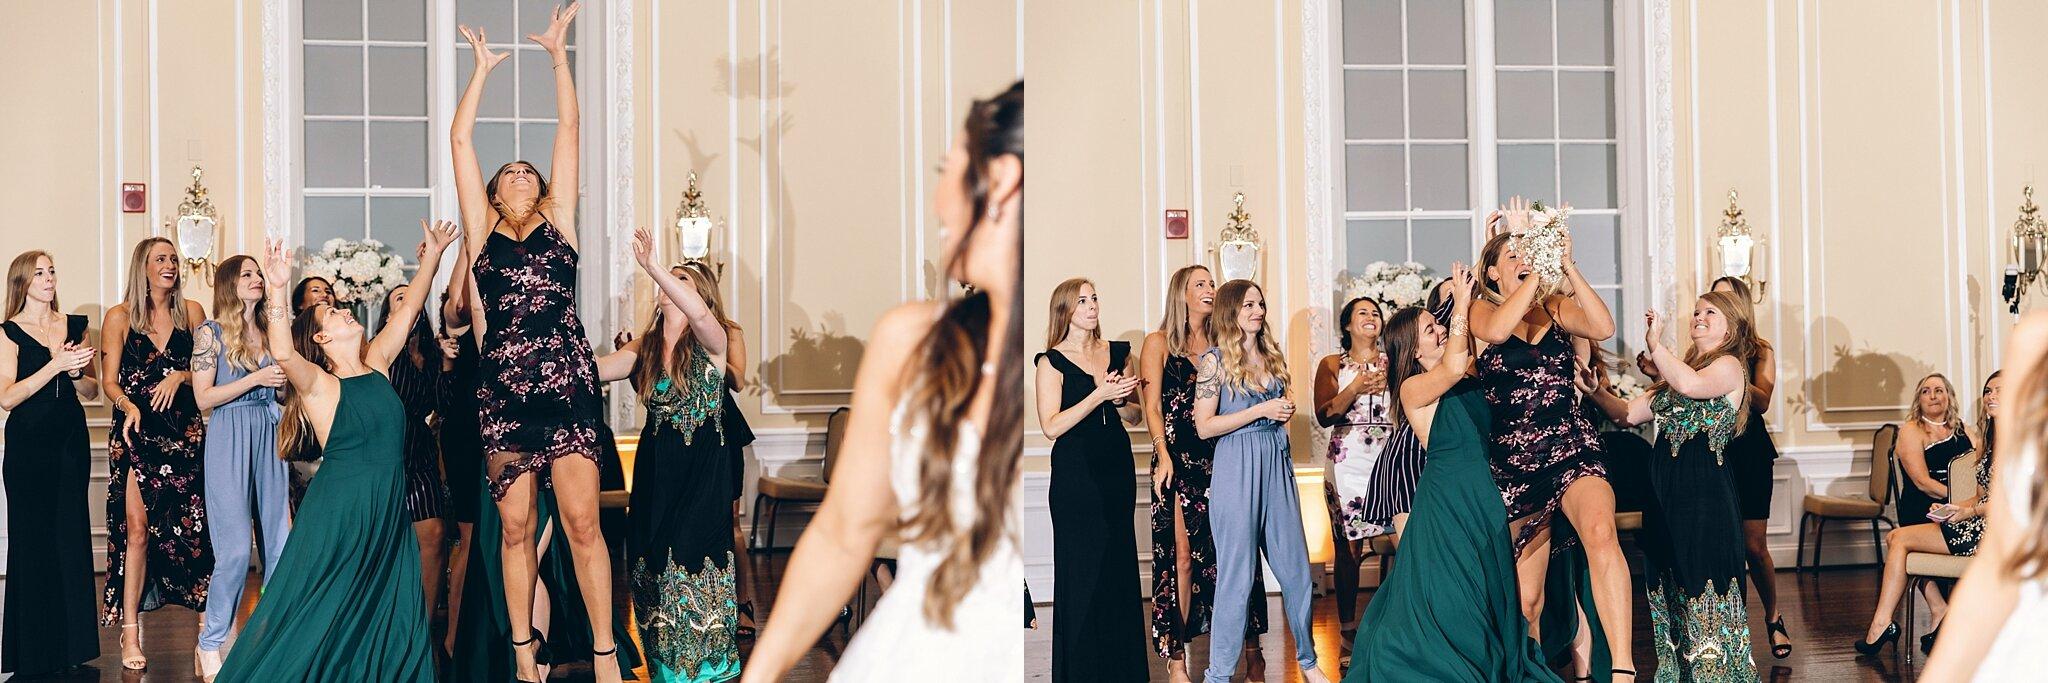 patrick-henry-ballroom-wedding-roanoke_0553.jpg